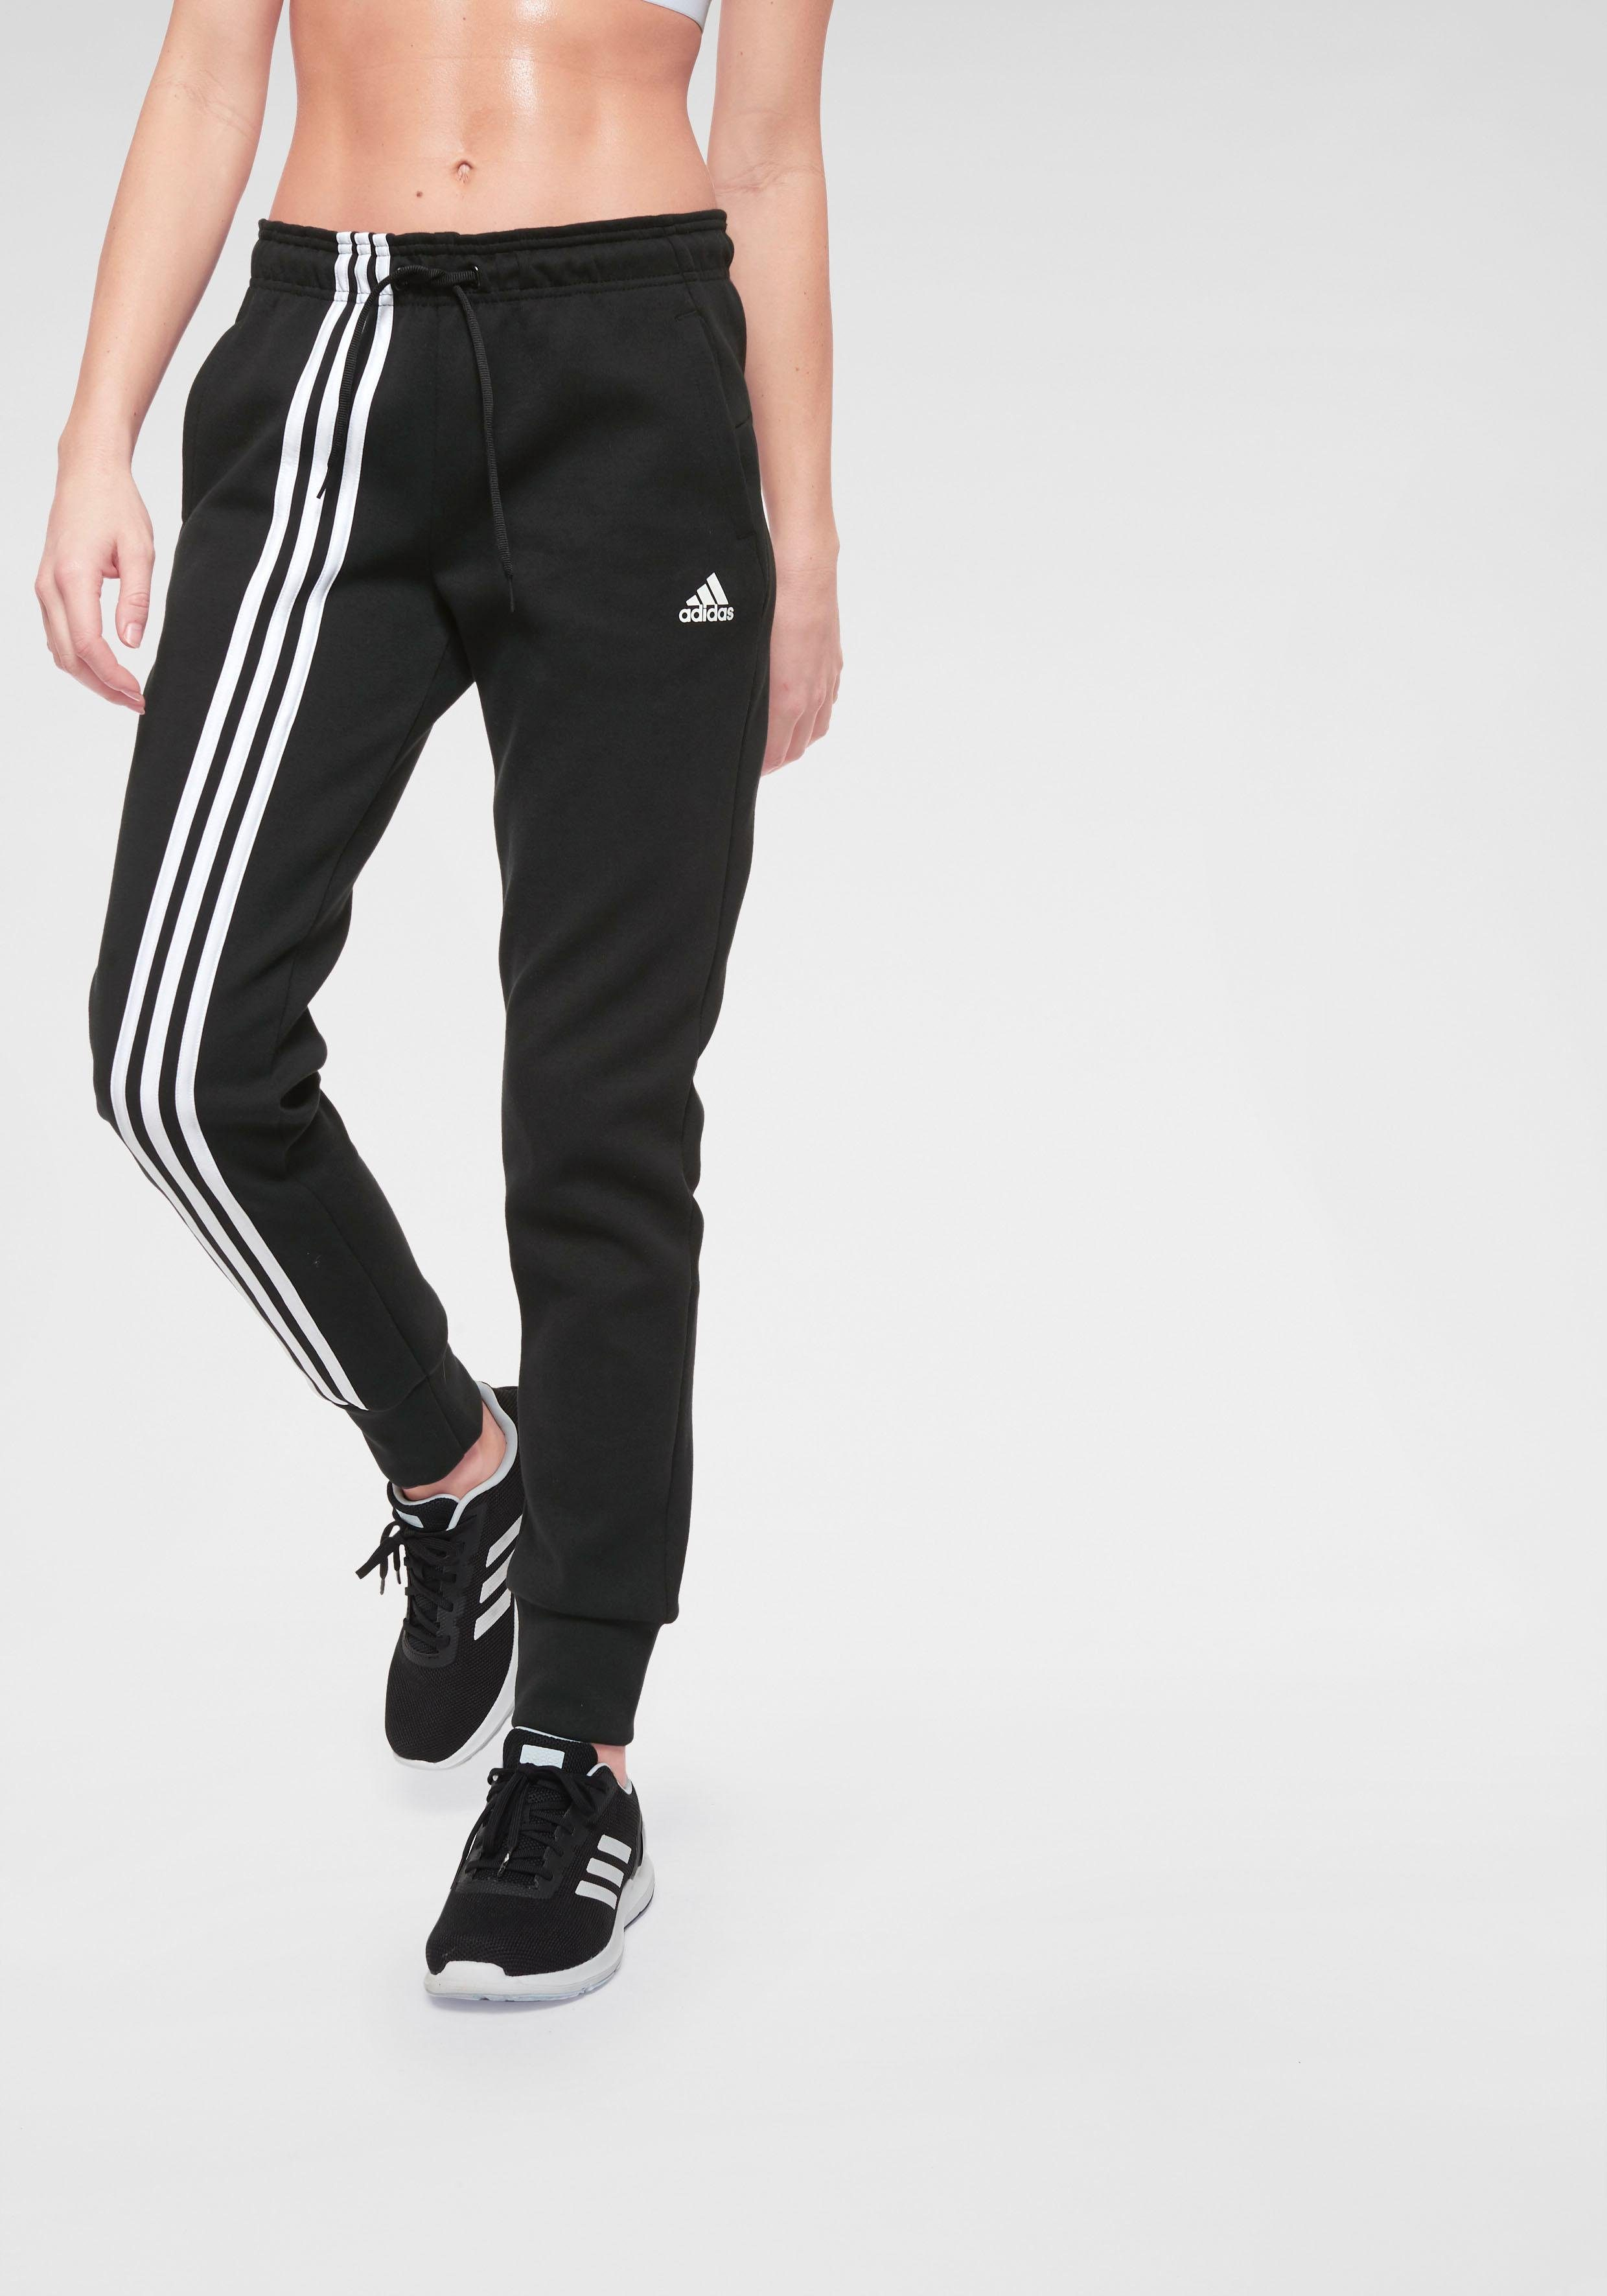 adidas Jogginghose »W E 3 STRIPES PANT SJ« kaufen | OTTO